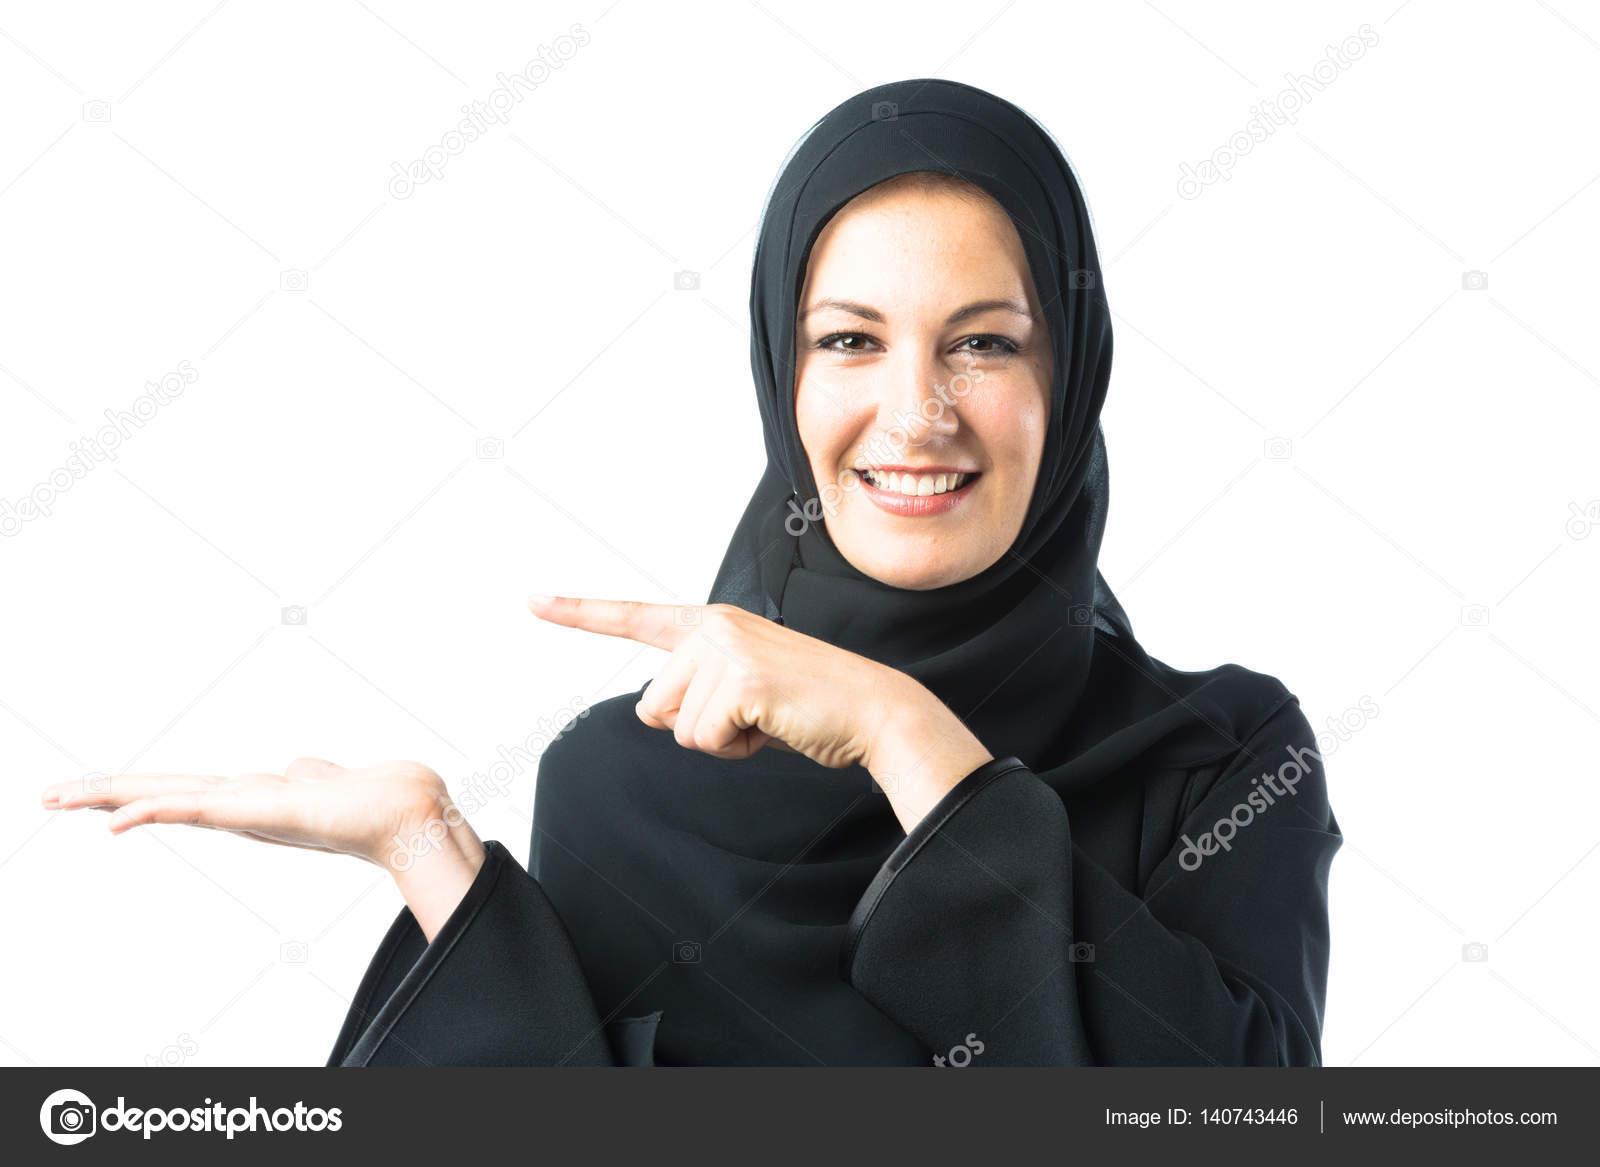 6a5b3dd46 Imágenes: ropa arabe de mujer   mujer joven, usando ropa árabe ...